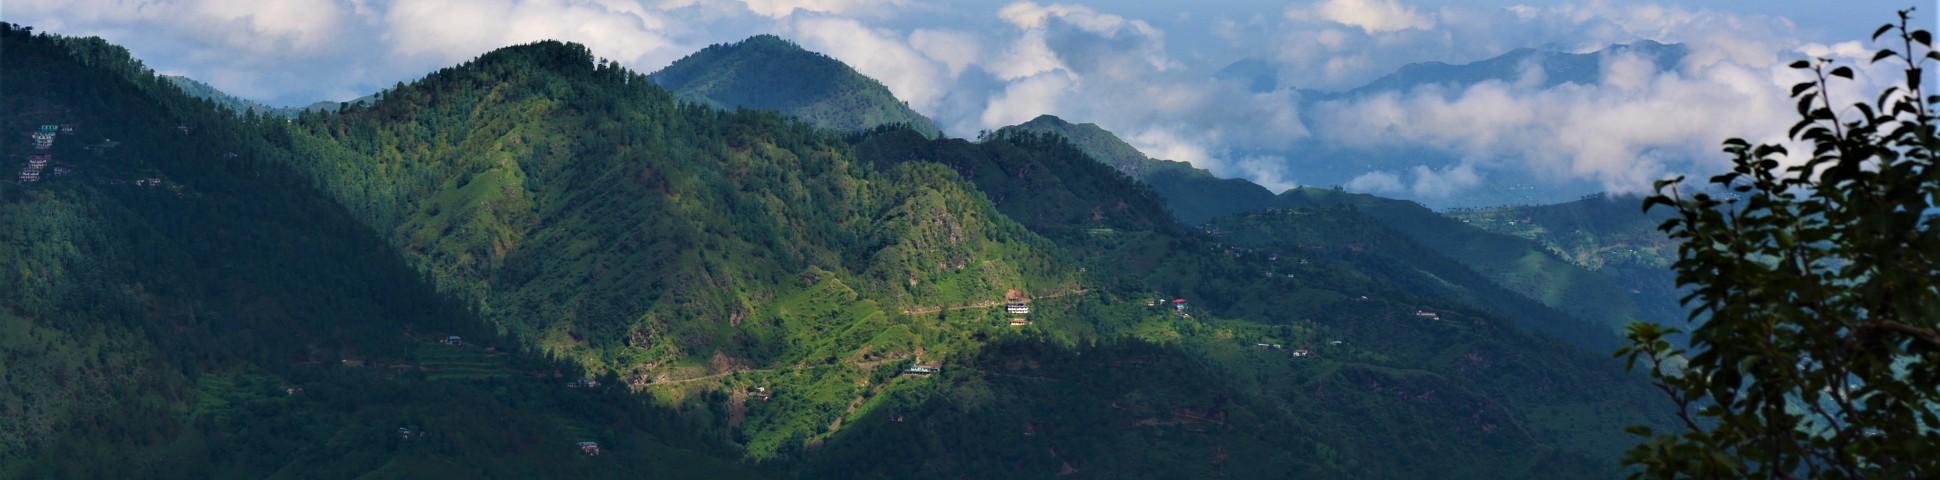 Himachal Pradesh in India